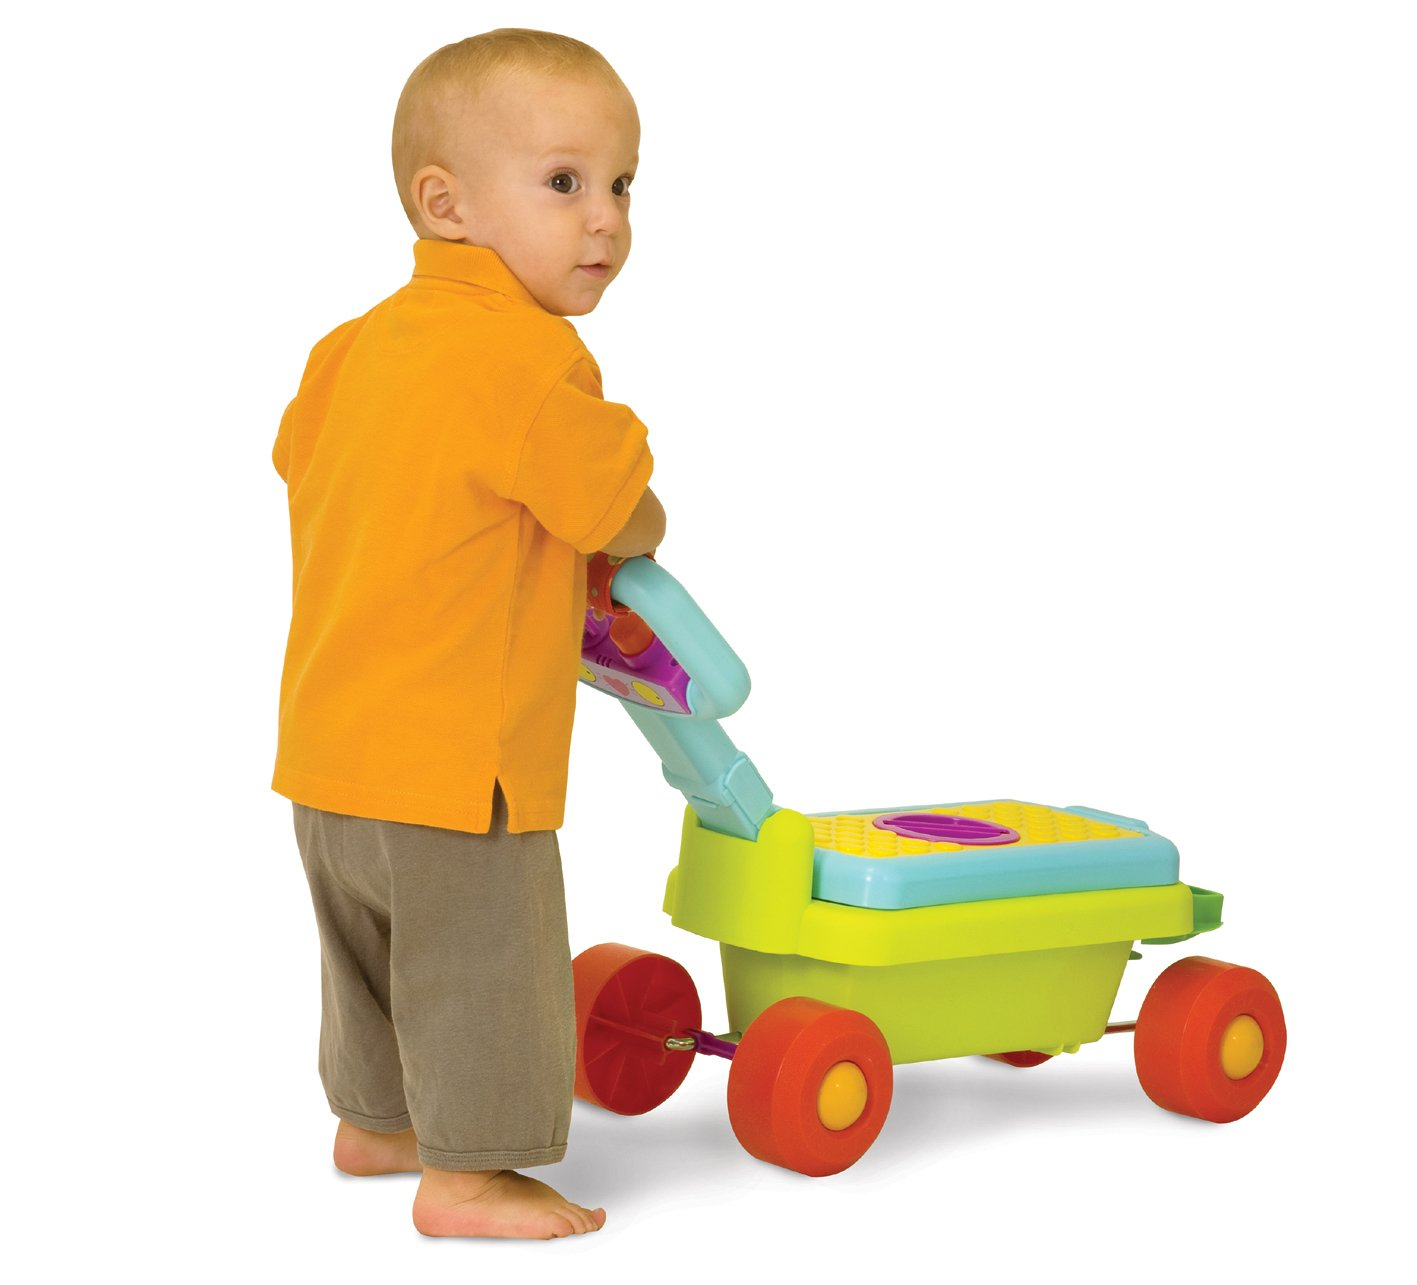 Amazon.com: Walker 4 en 1: Toys & Games